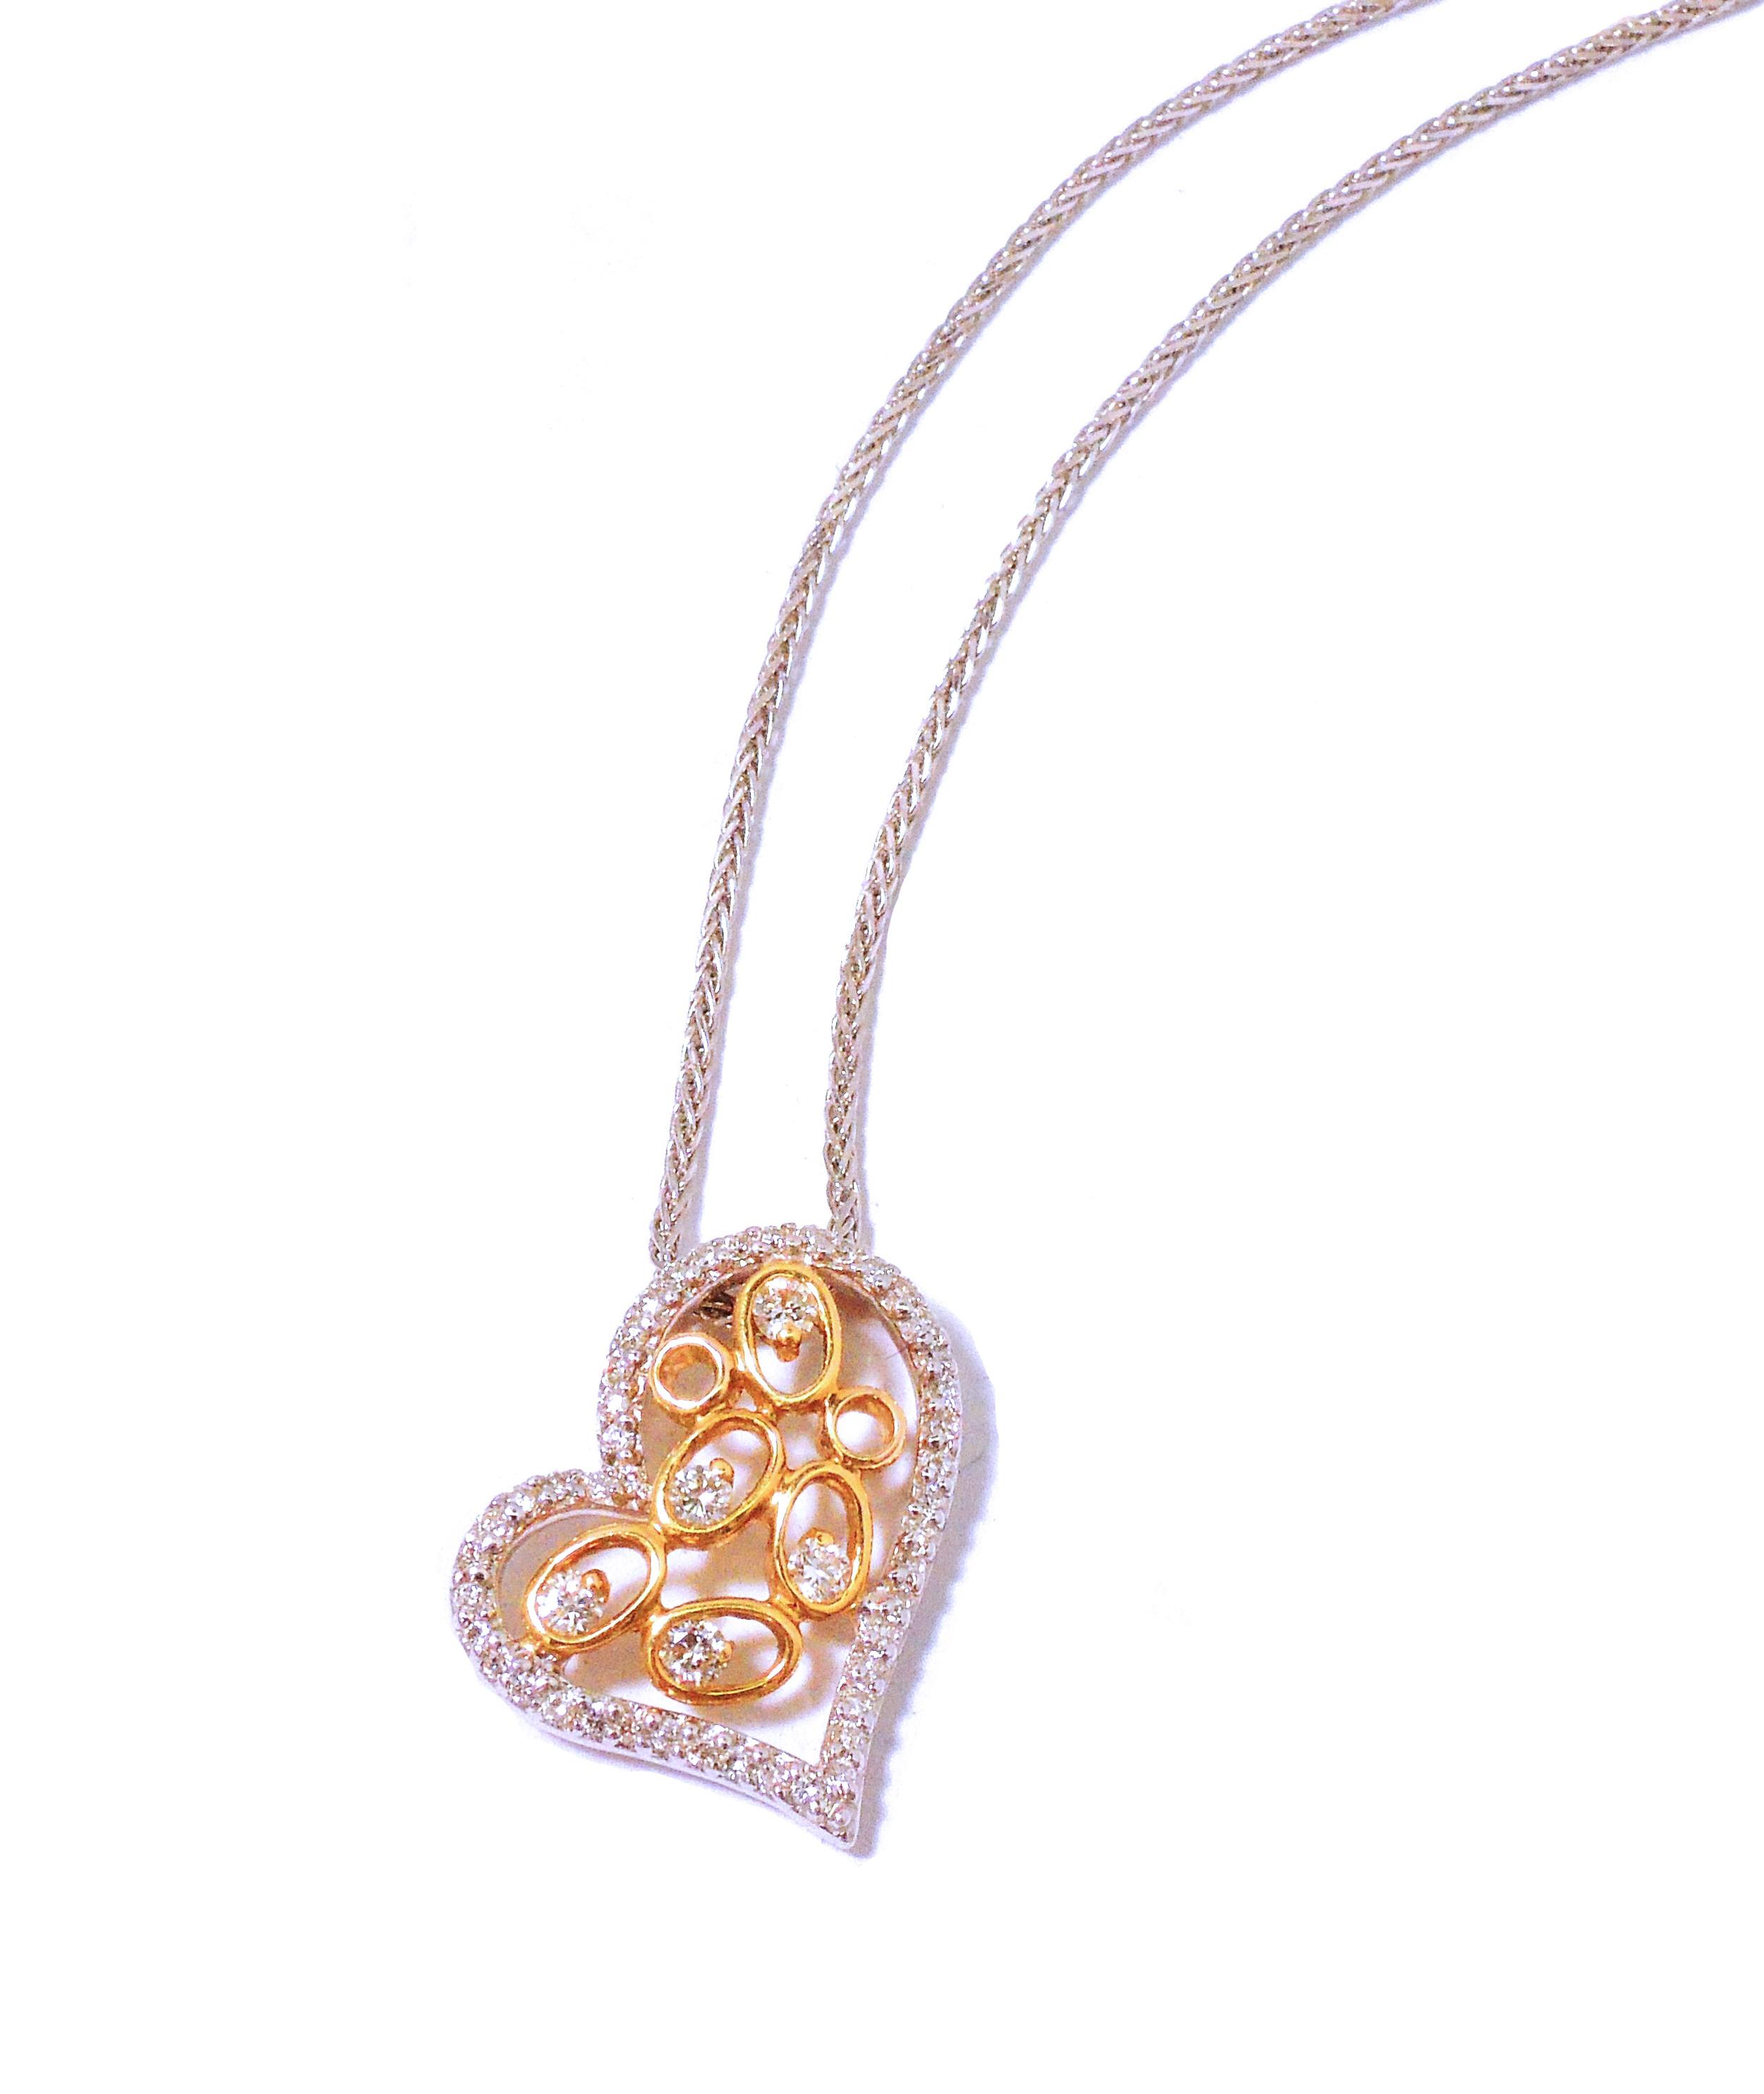 Two-Tone Gold & Diamond Heart Pendant